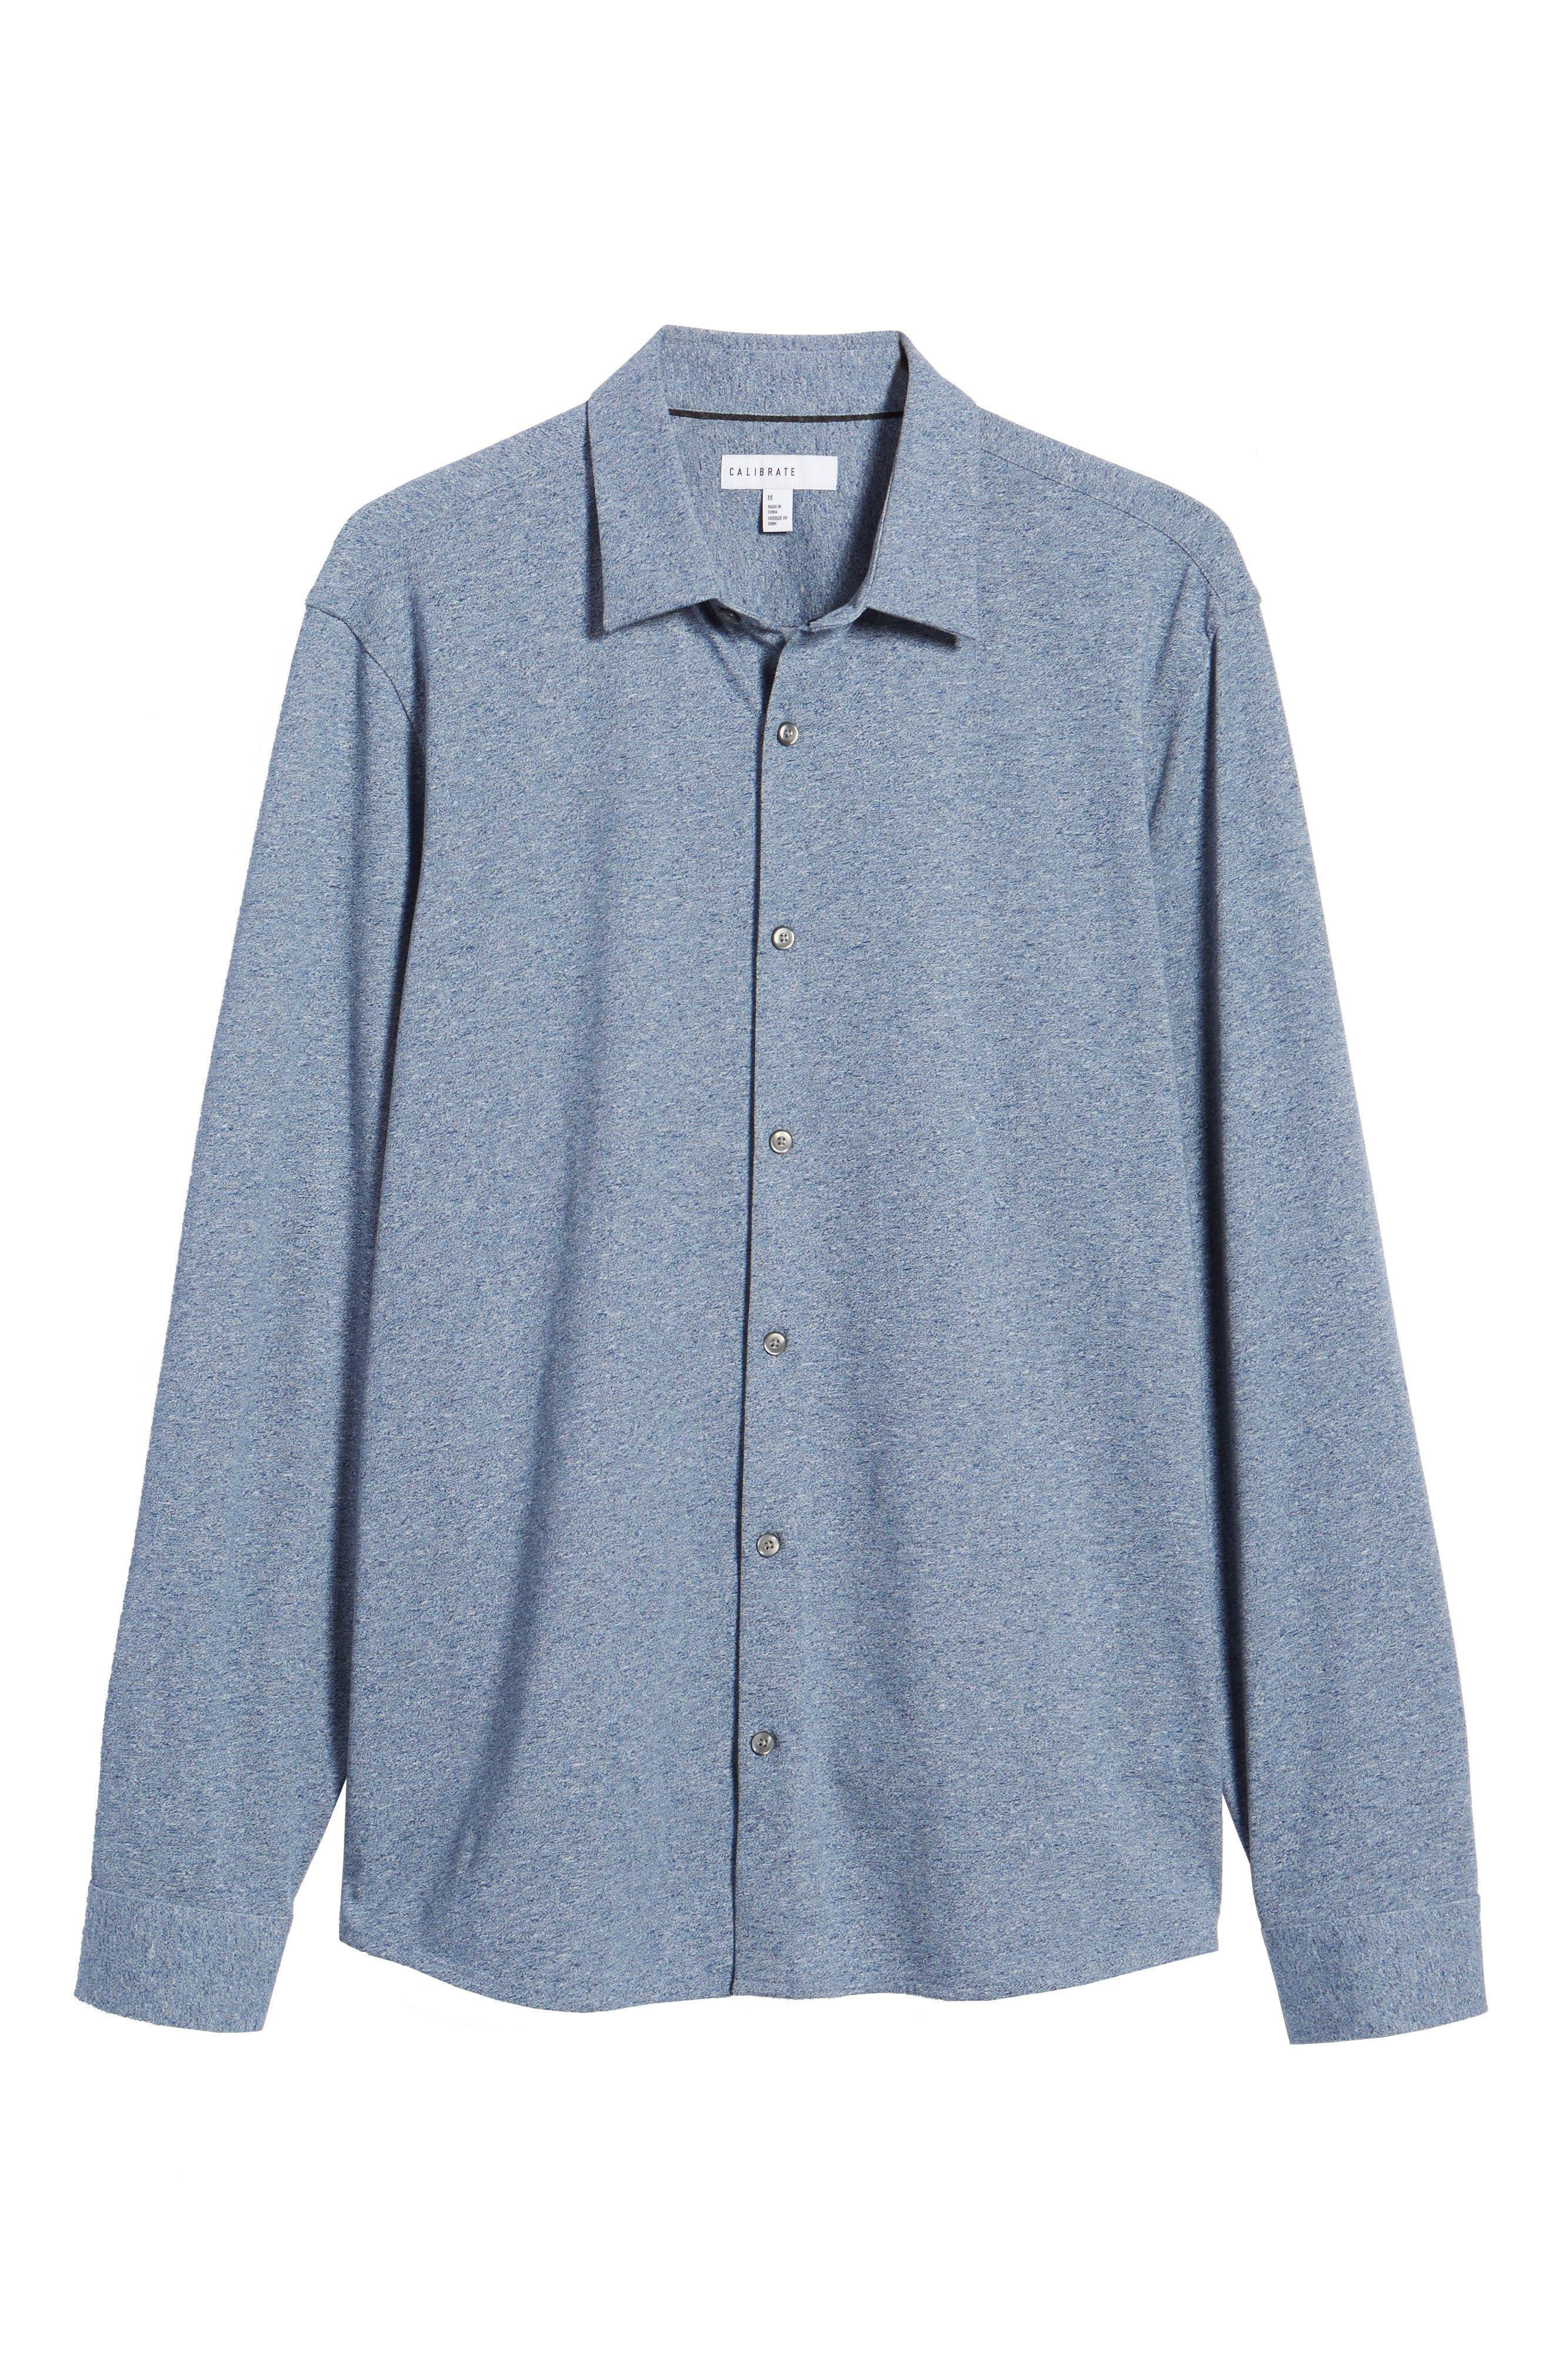 Knit Sport Shirt,                             Alternate thumbnail 6, color,                             030